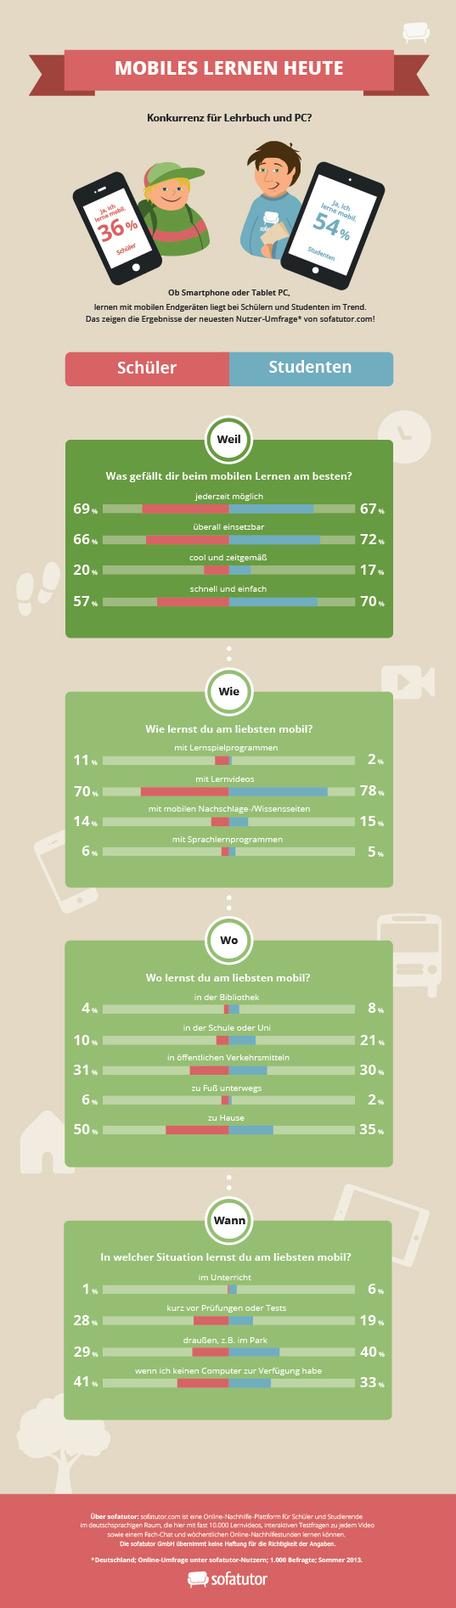 Infografik: Lernen mit mobilen Geräten liegt voll im Trend   MIK   Scoop.it